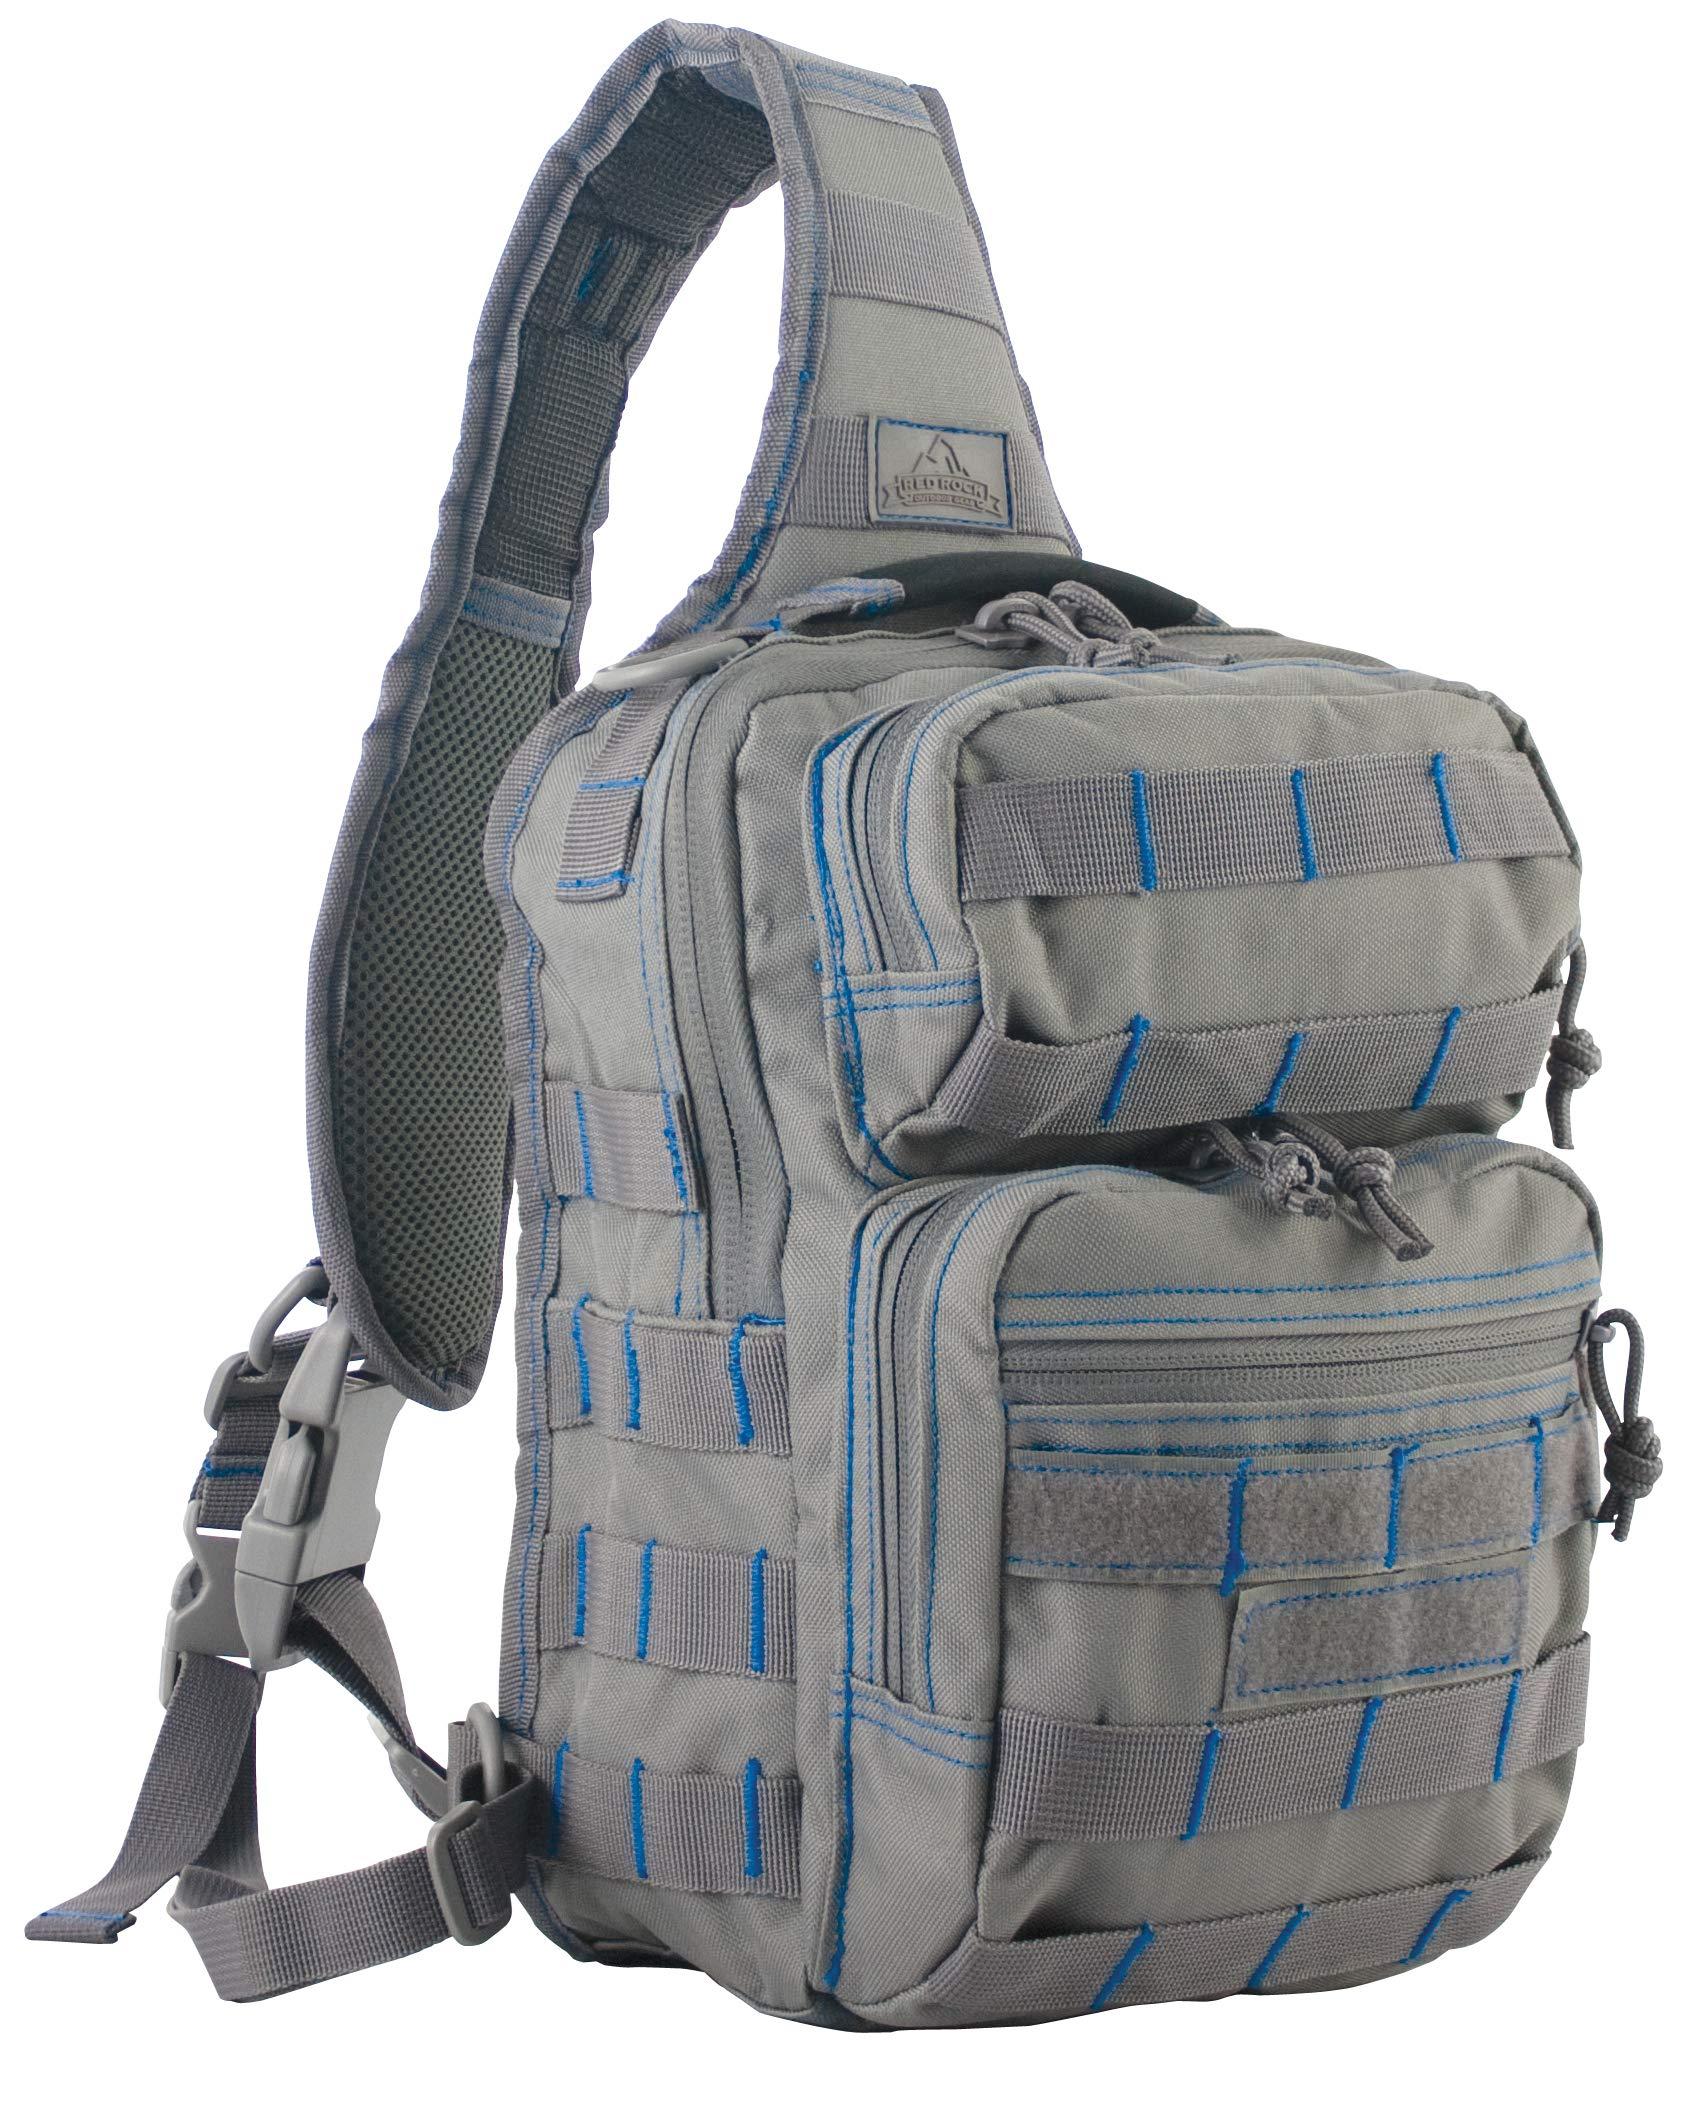 Red Rock Outdoor Gear Rover Sling Pack Tornado/Blue